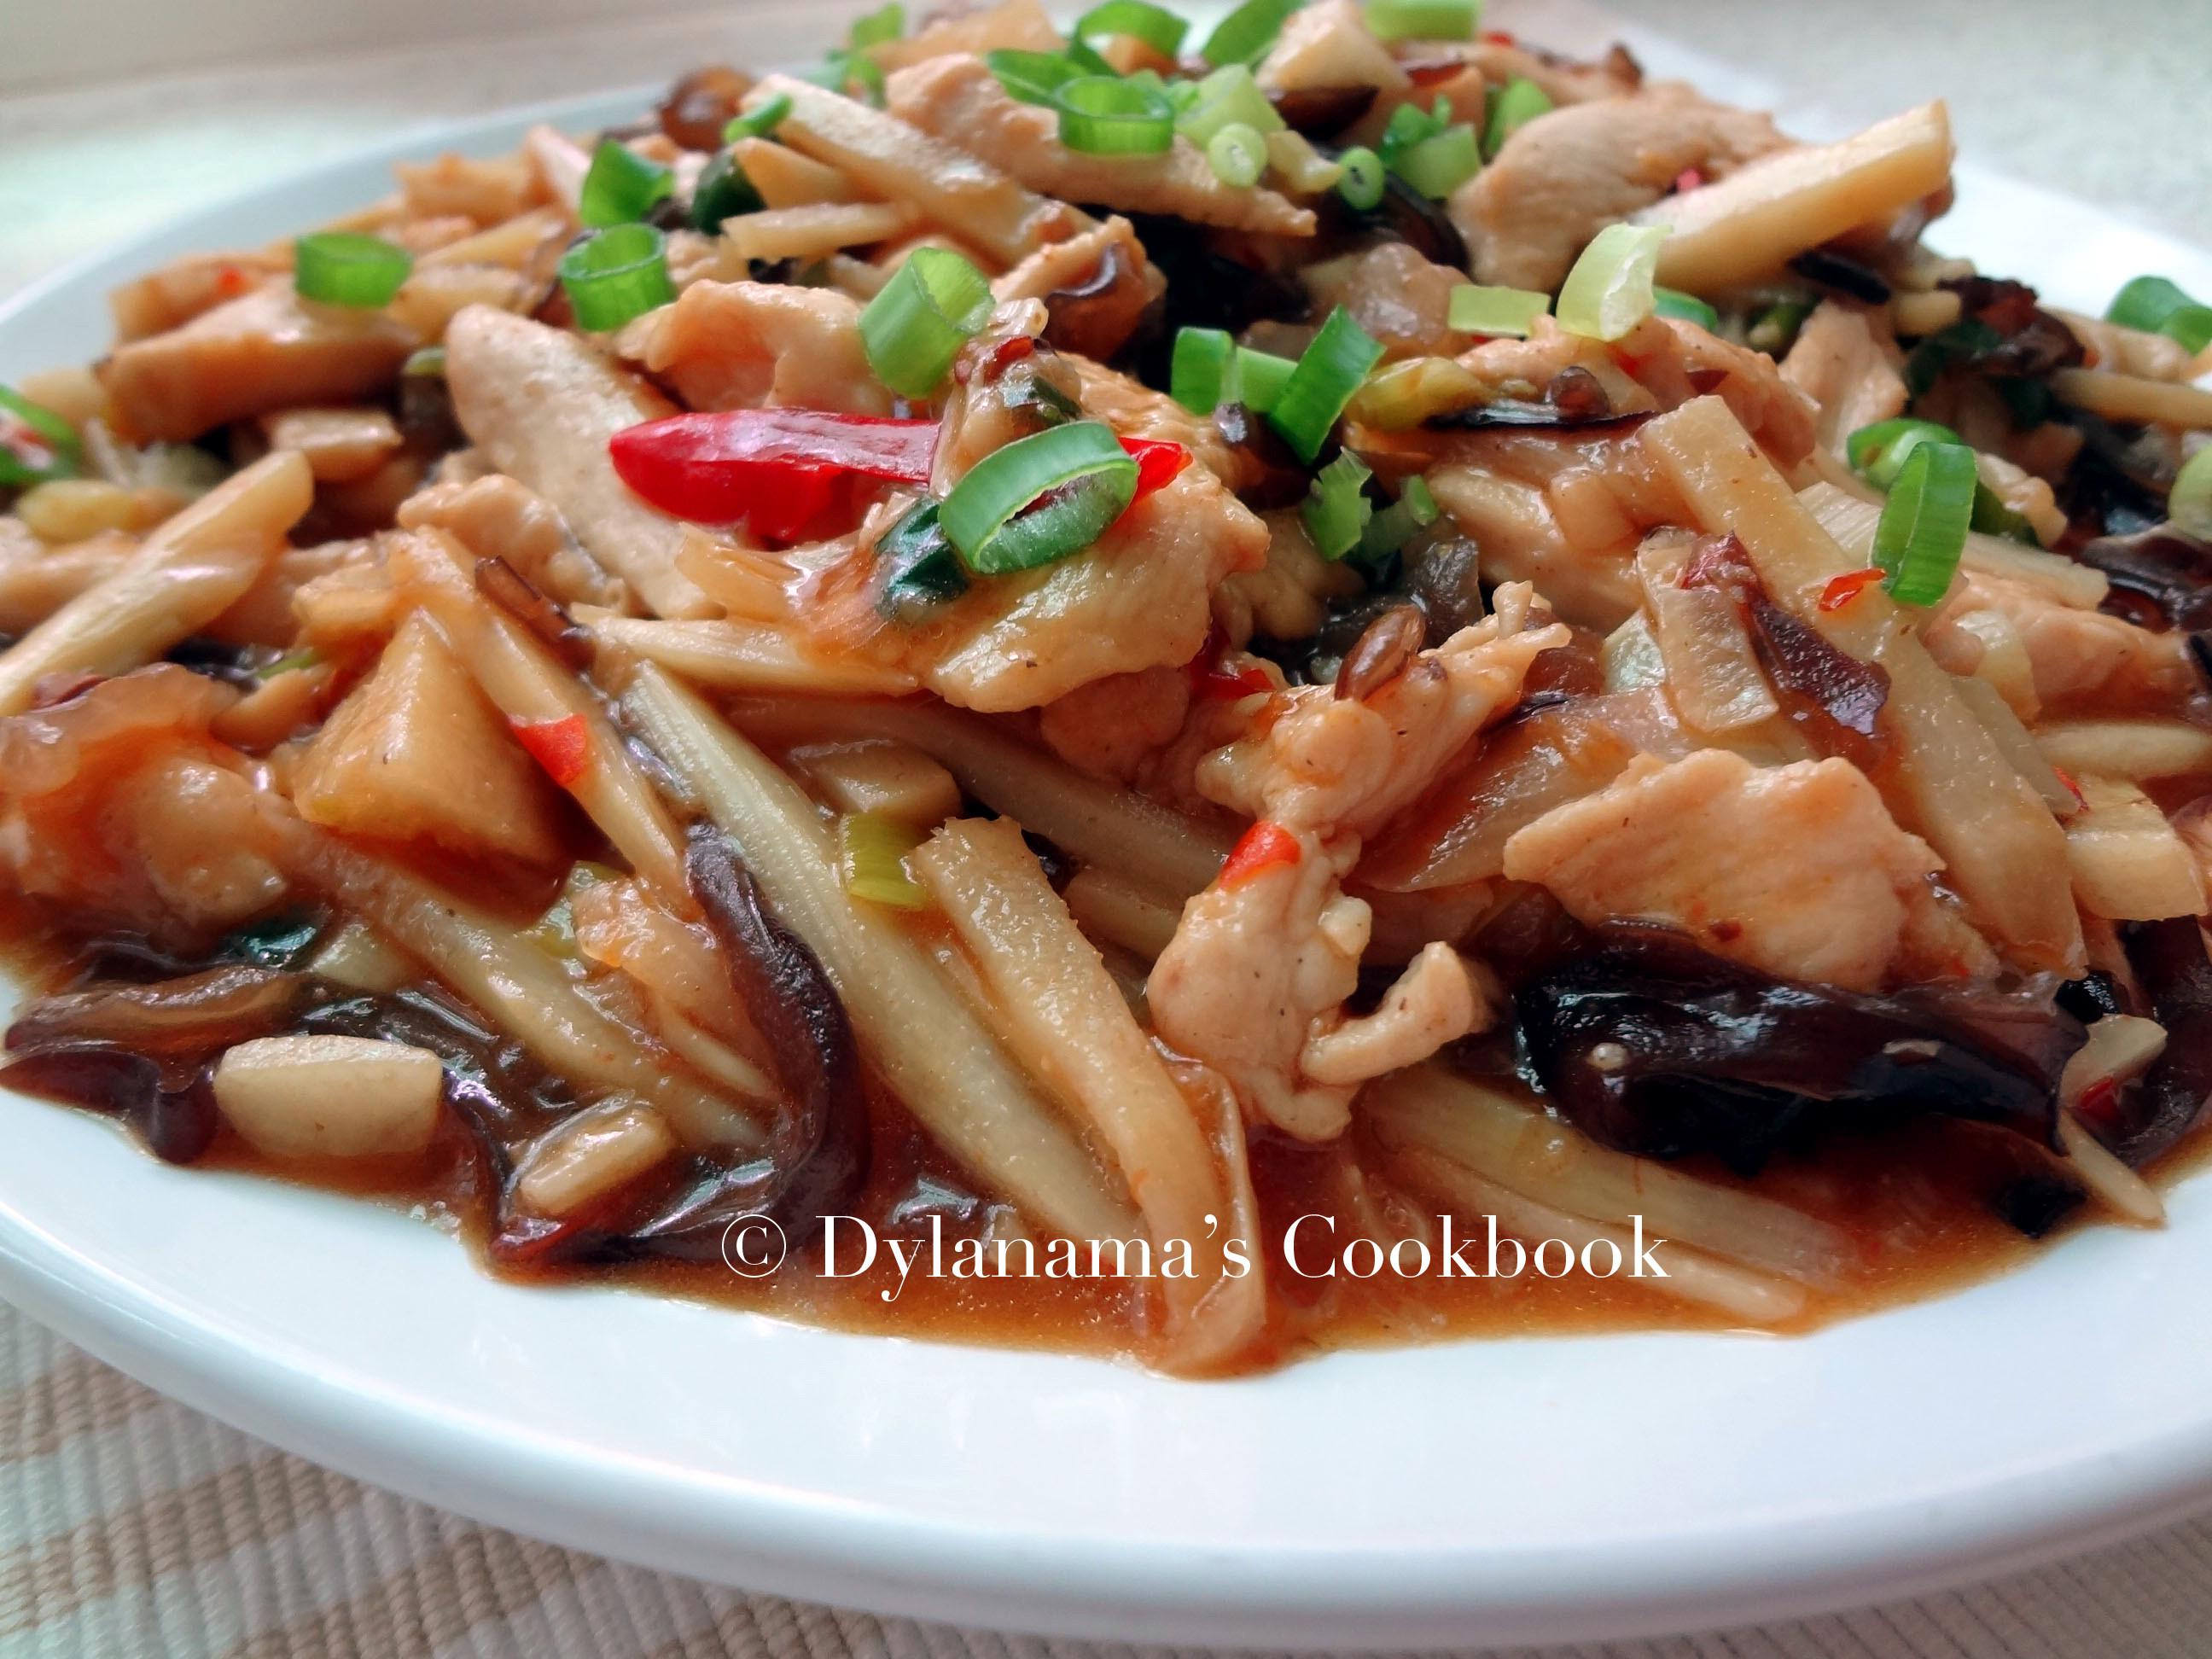 DYLANAMA ♥ 魚香肉絲